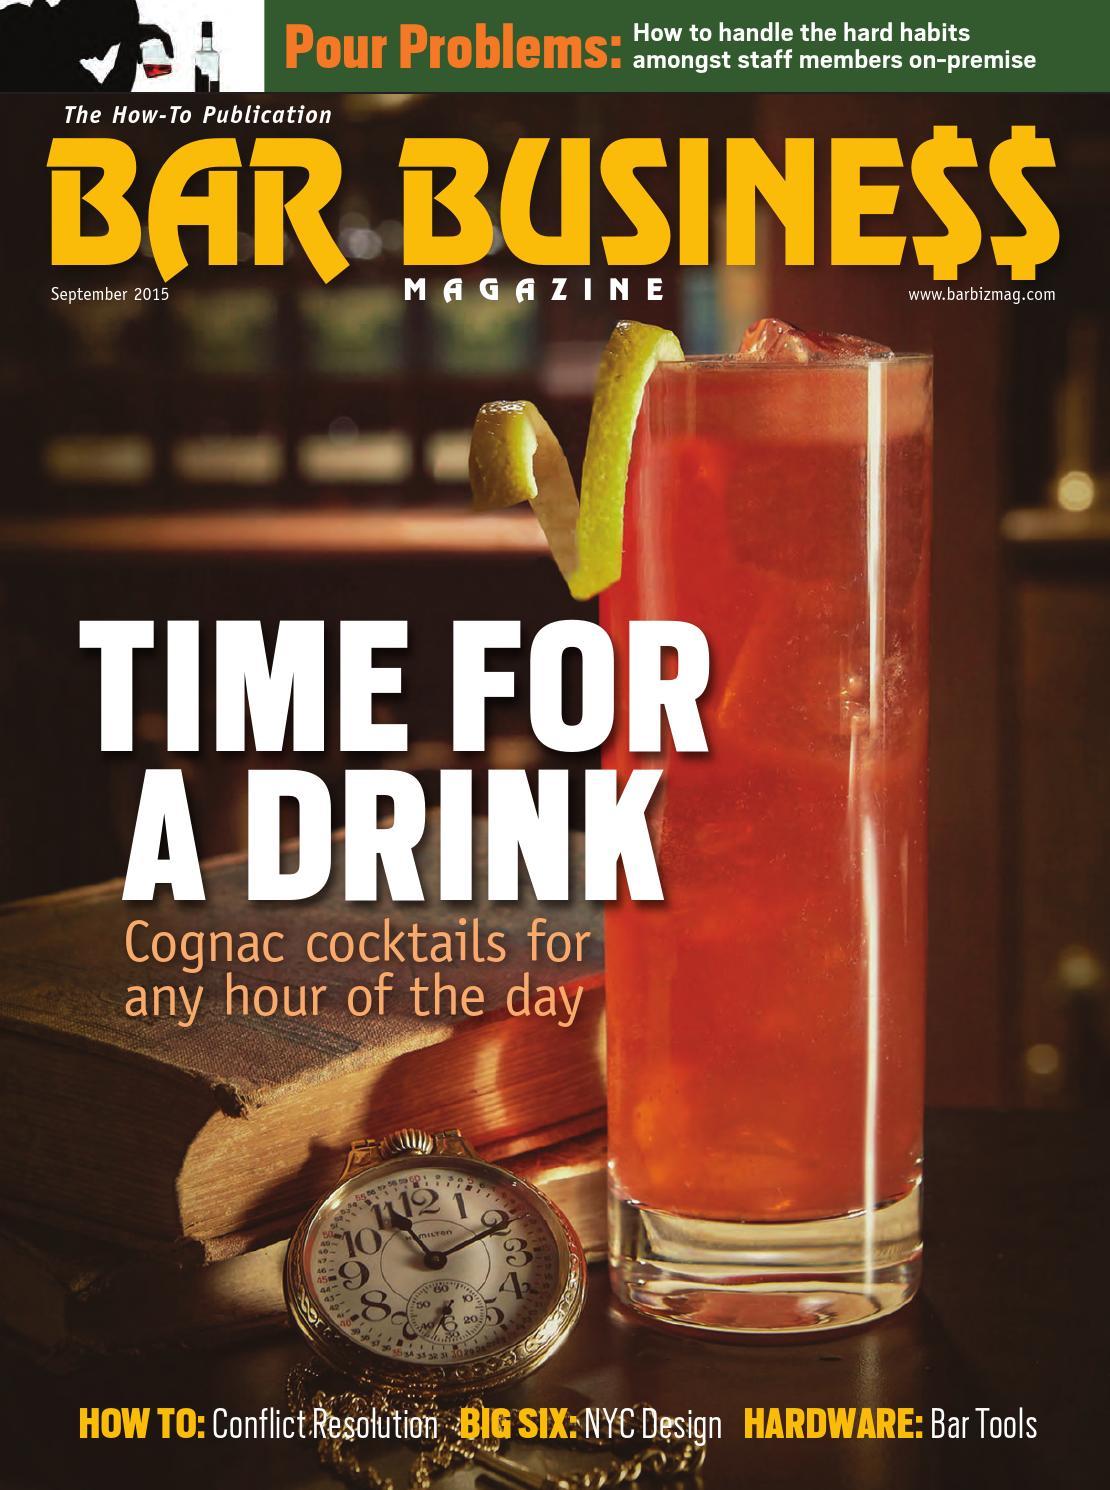 September 2015 Bar Business by Bar Business Magazine - issuu